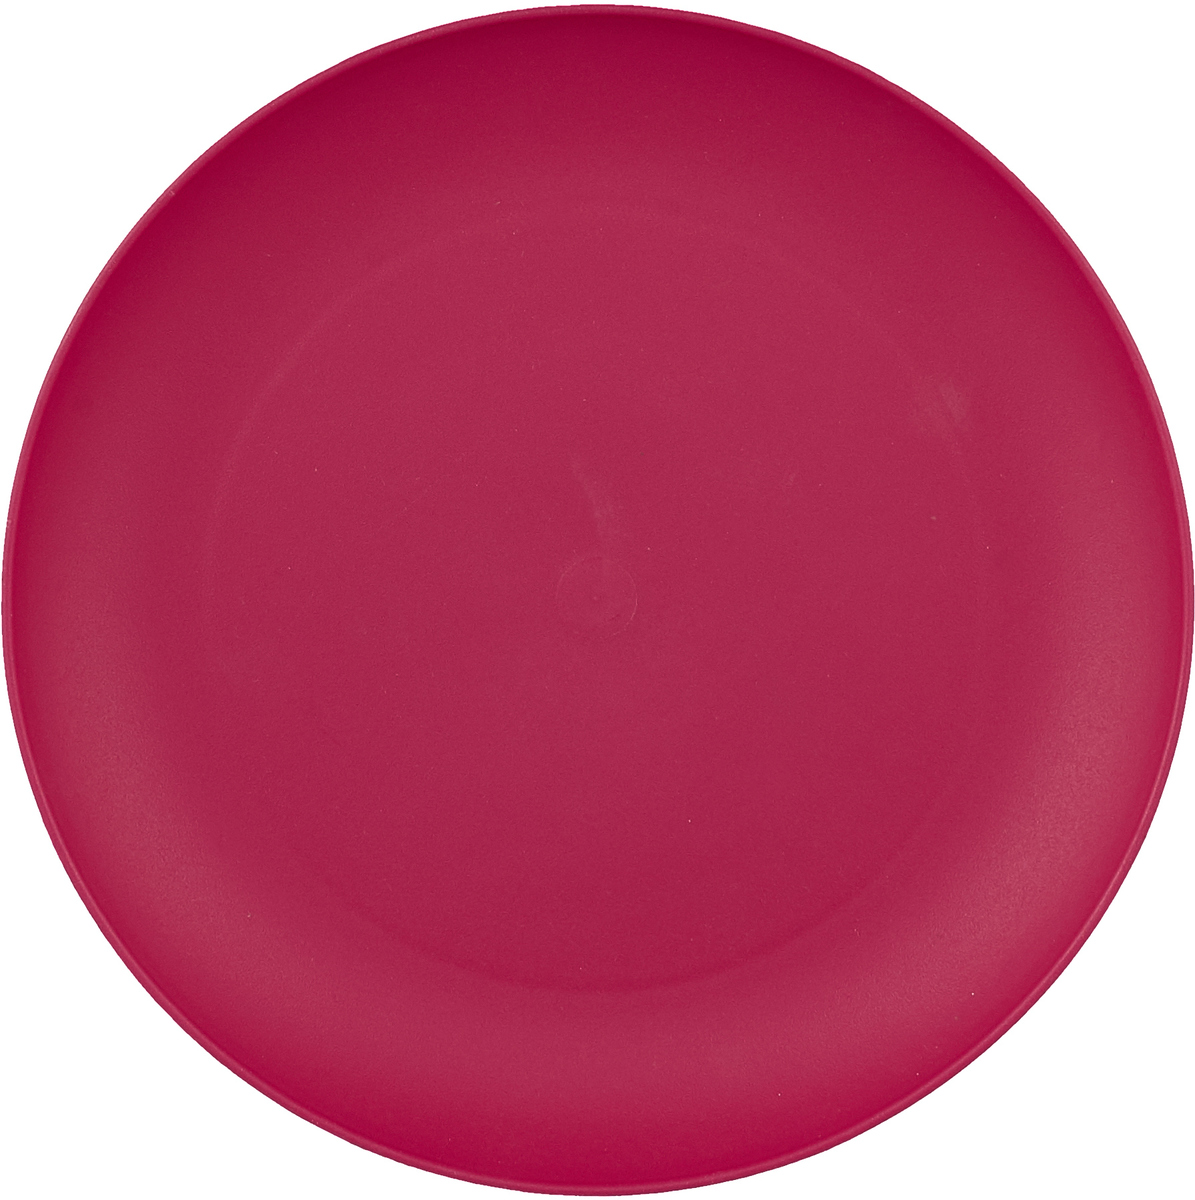 Тарелка Gotoff, цвет: малиновый, диаметр 20,3 смWTC-271_малиновый_23Тарелка Gotoff, цвет: малиновый, диаметр 20,3 см